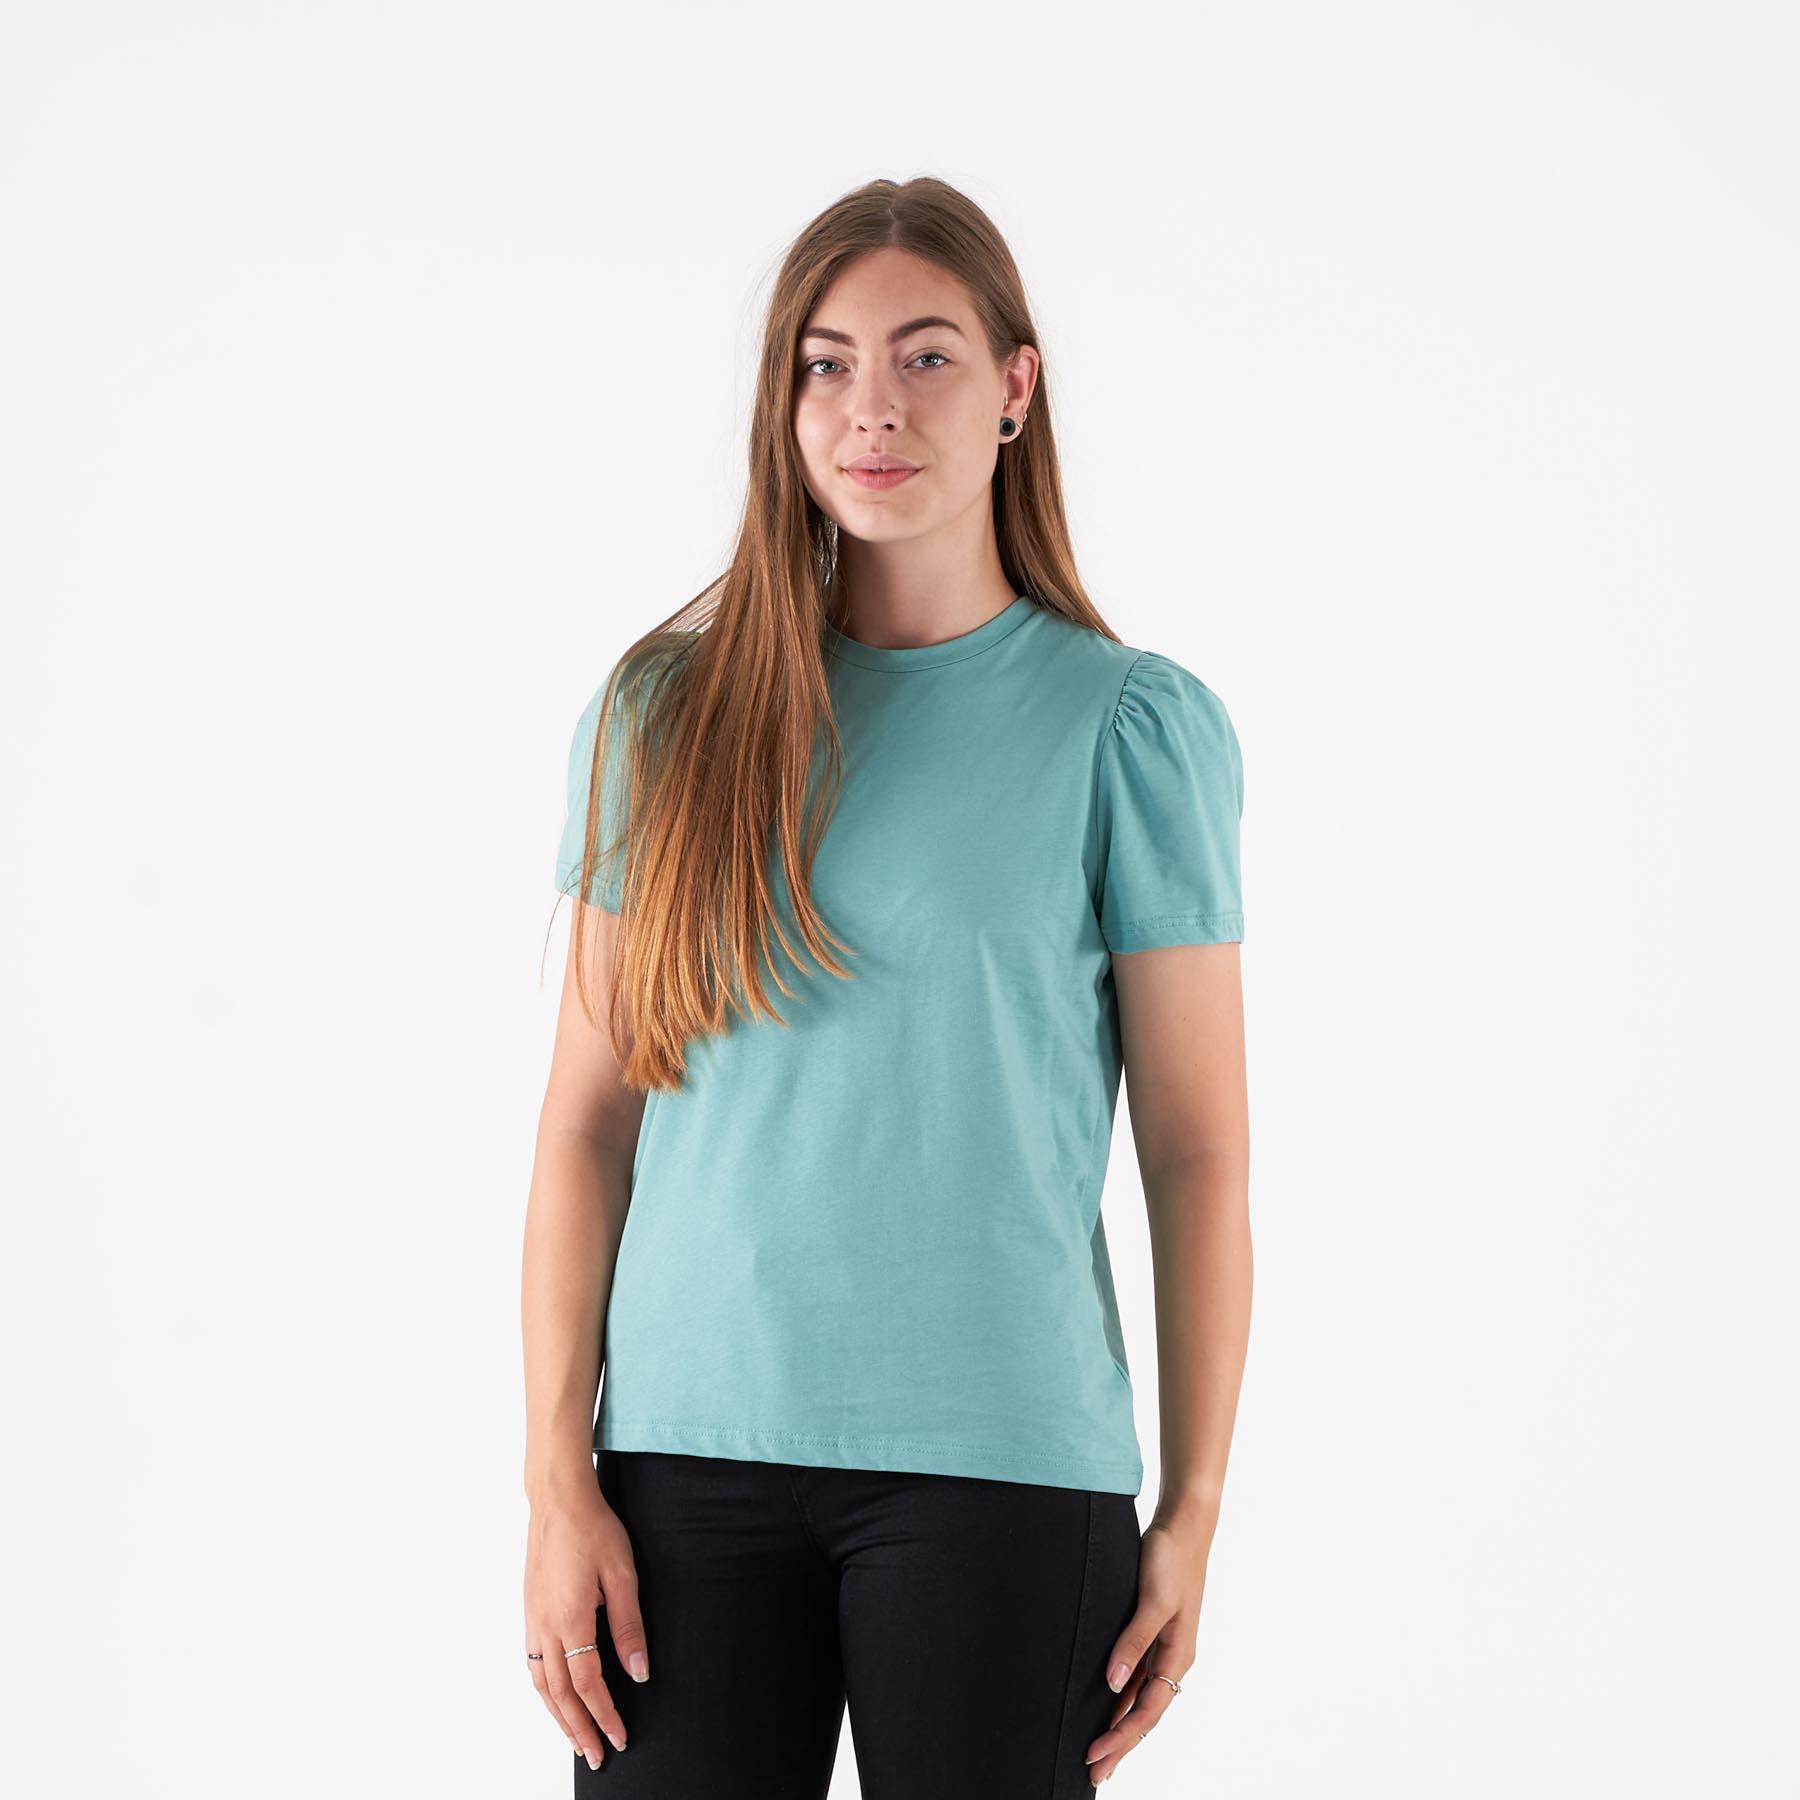 Pure friday - Purbeli puff tee - T-shirts til damer - Grøn - XL